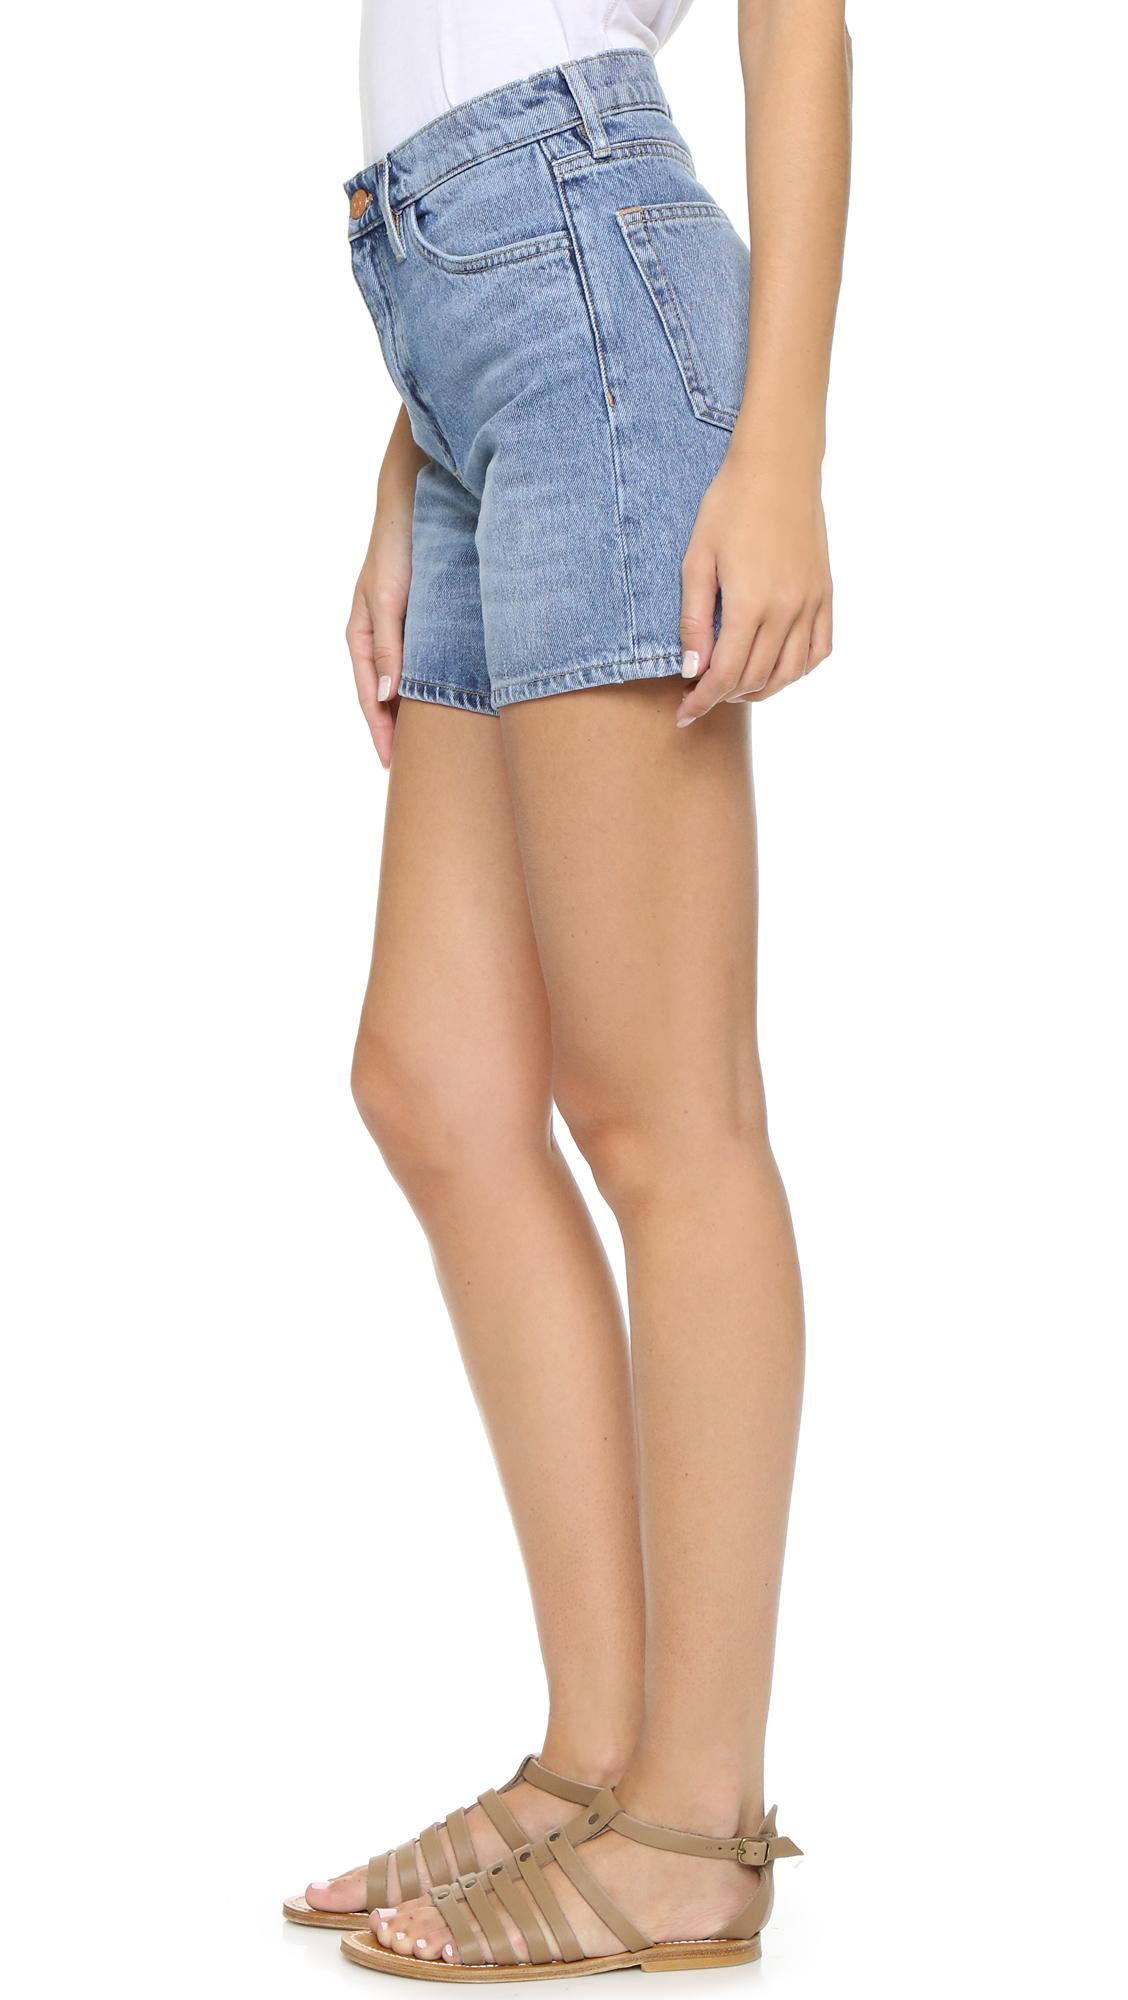 af5500d300 Lyst - M.i.h Jeans Jeanne Shorts in Blue